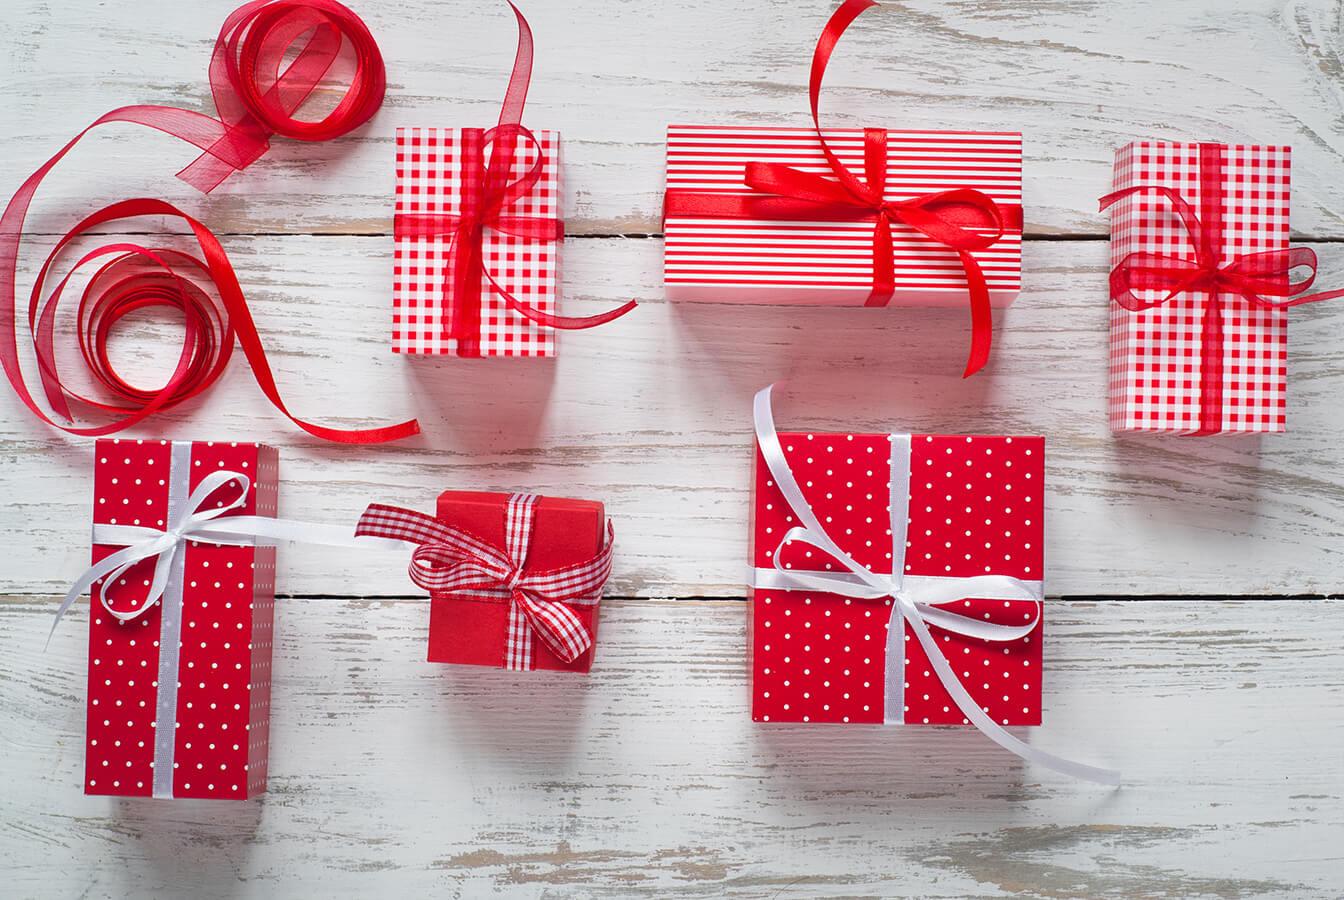 Gallery Gift box 4